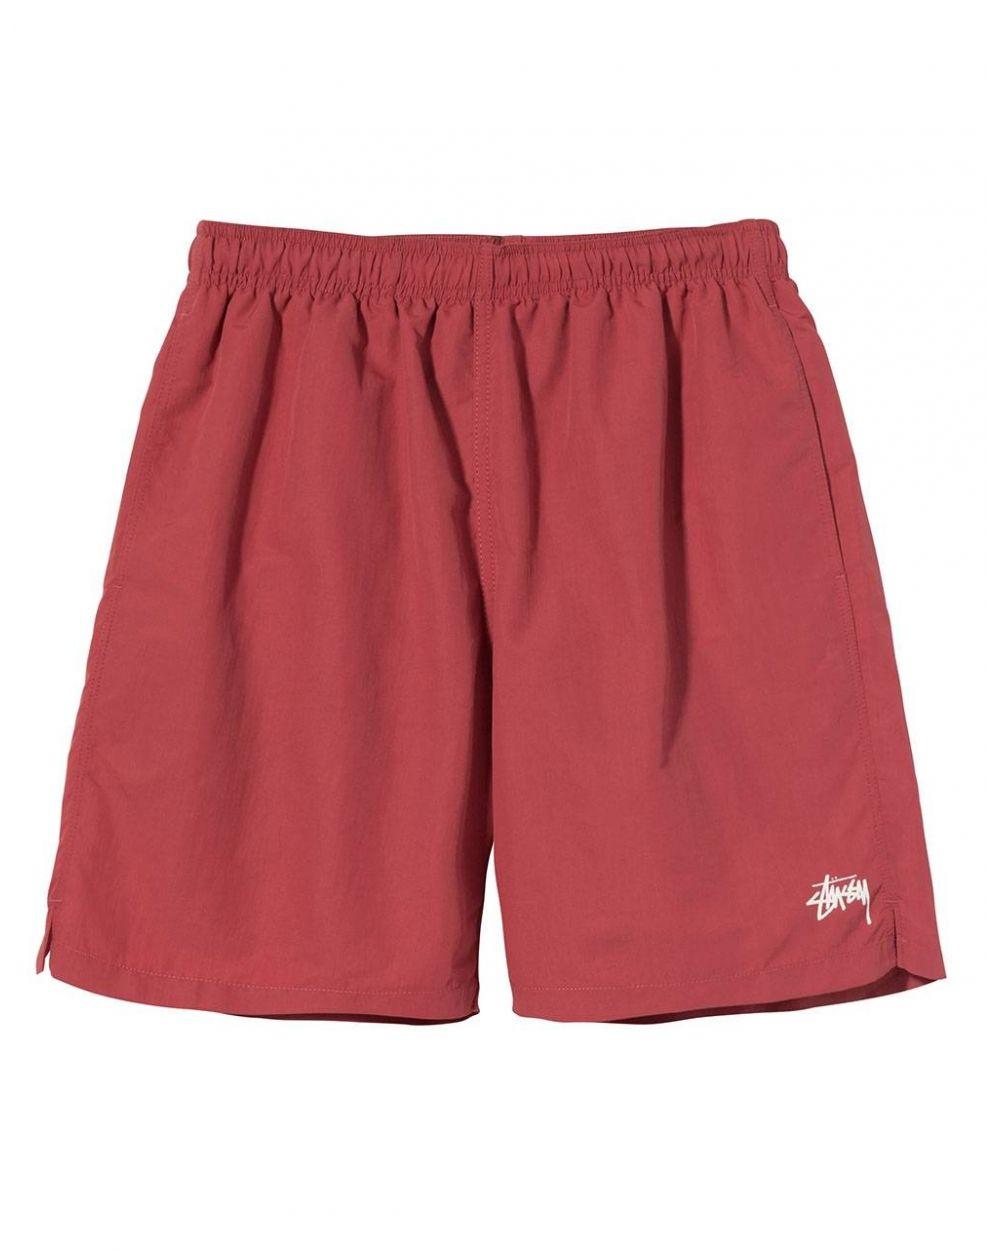 Stussy Stock Water shorts - red Stussy Shorts 85,00€